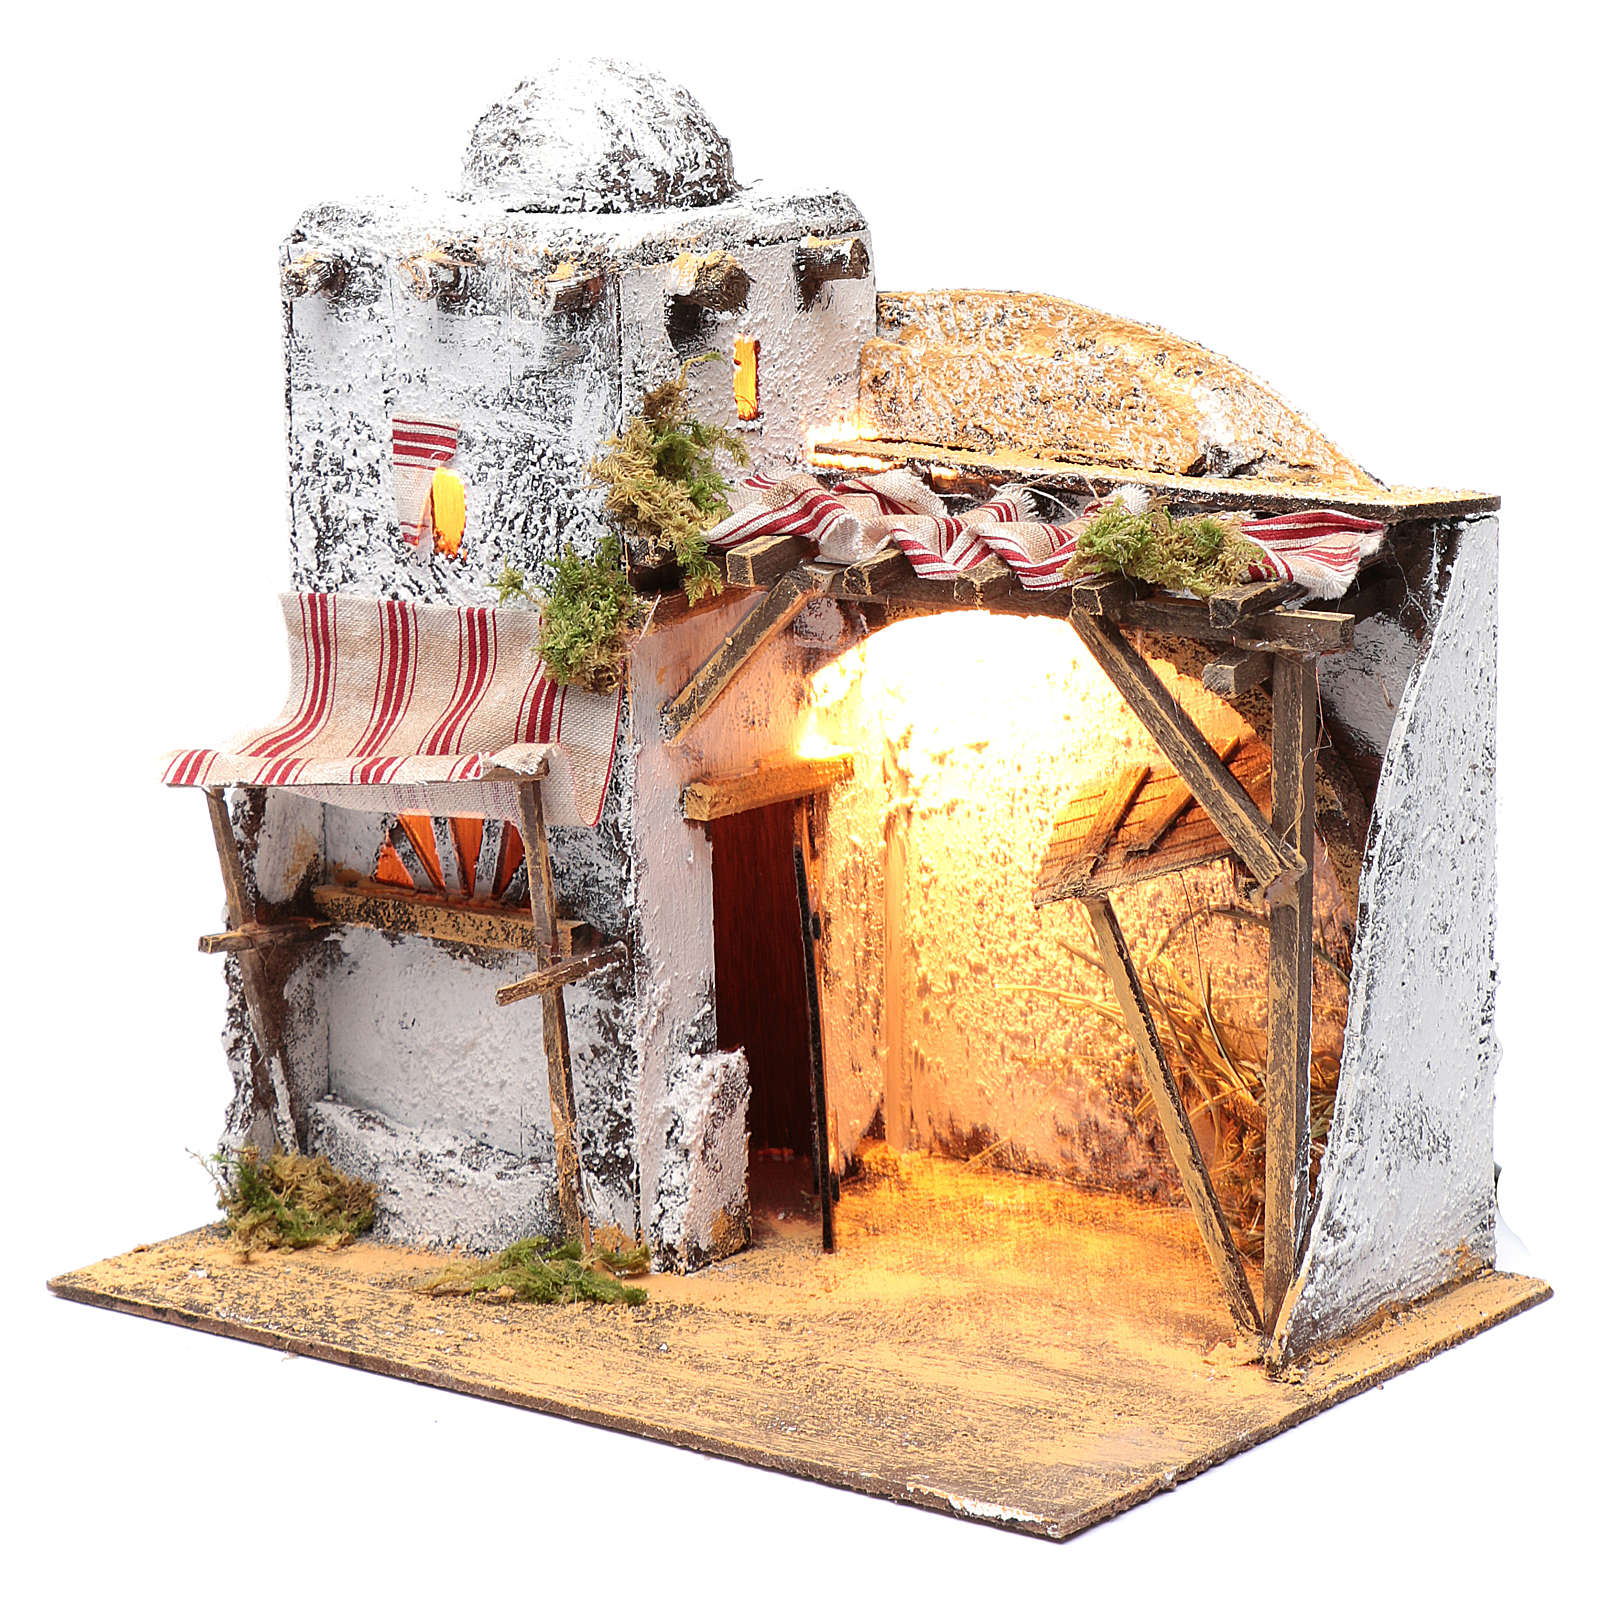 Neapolitan nativity scene Arabian setting 30x30x20 cm with curtain and trough 4